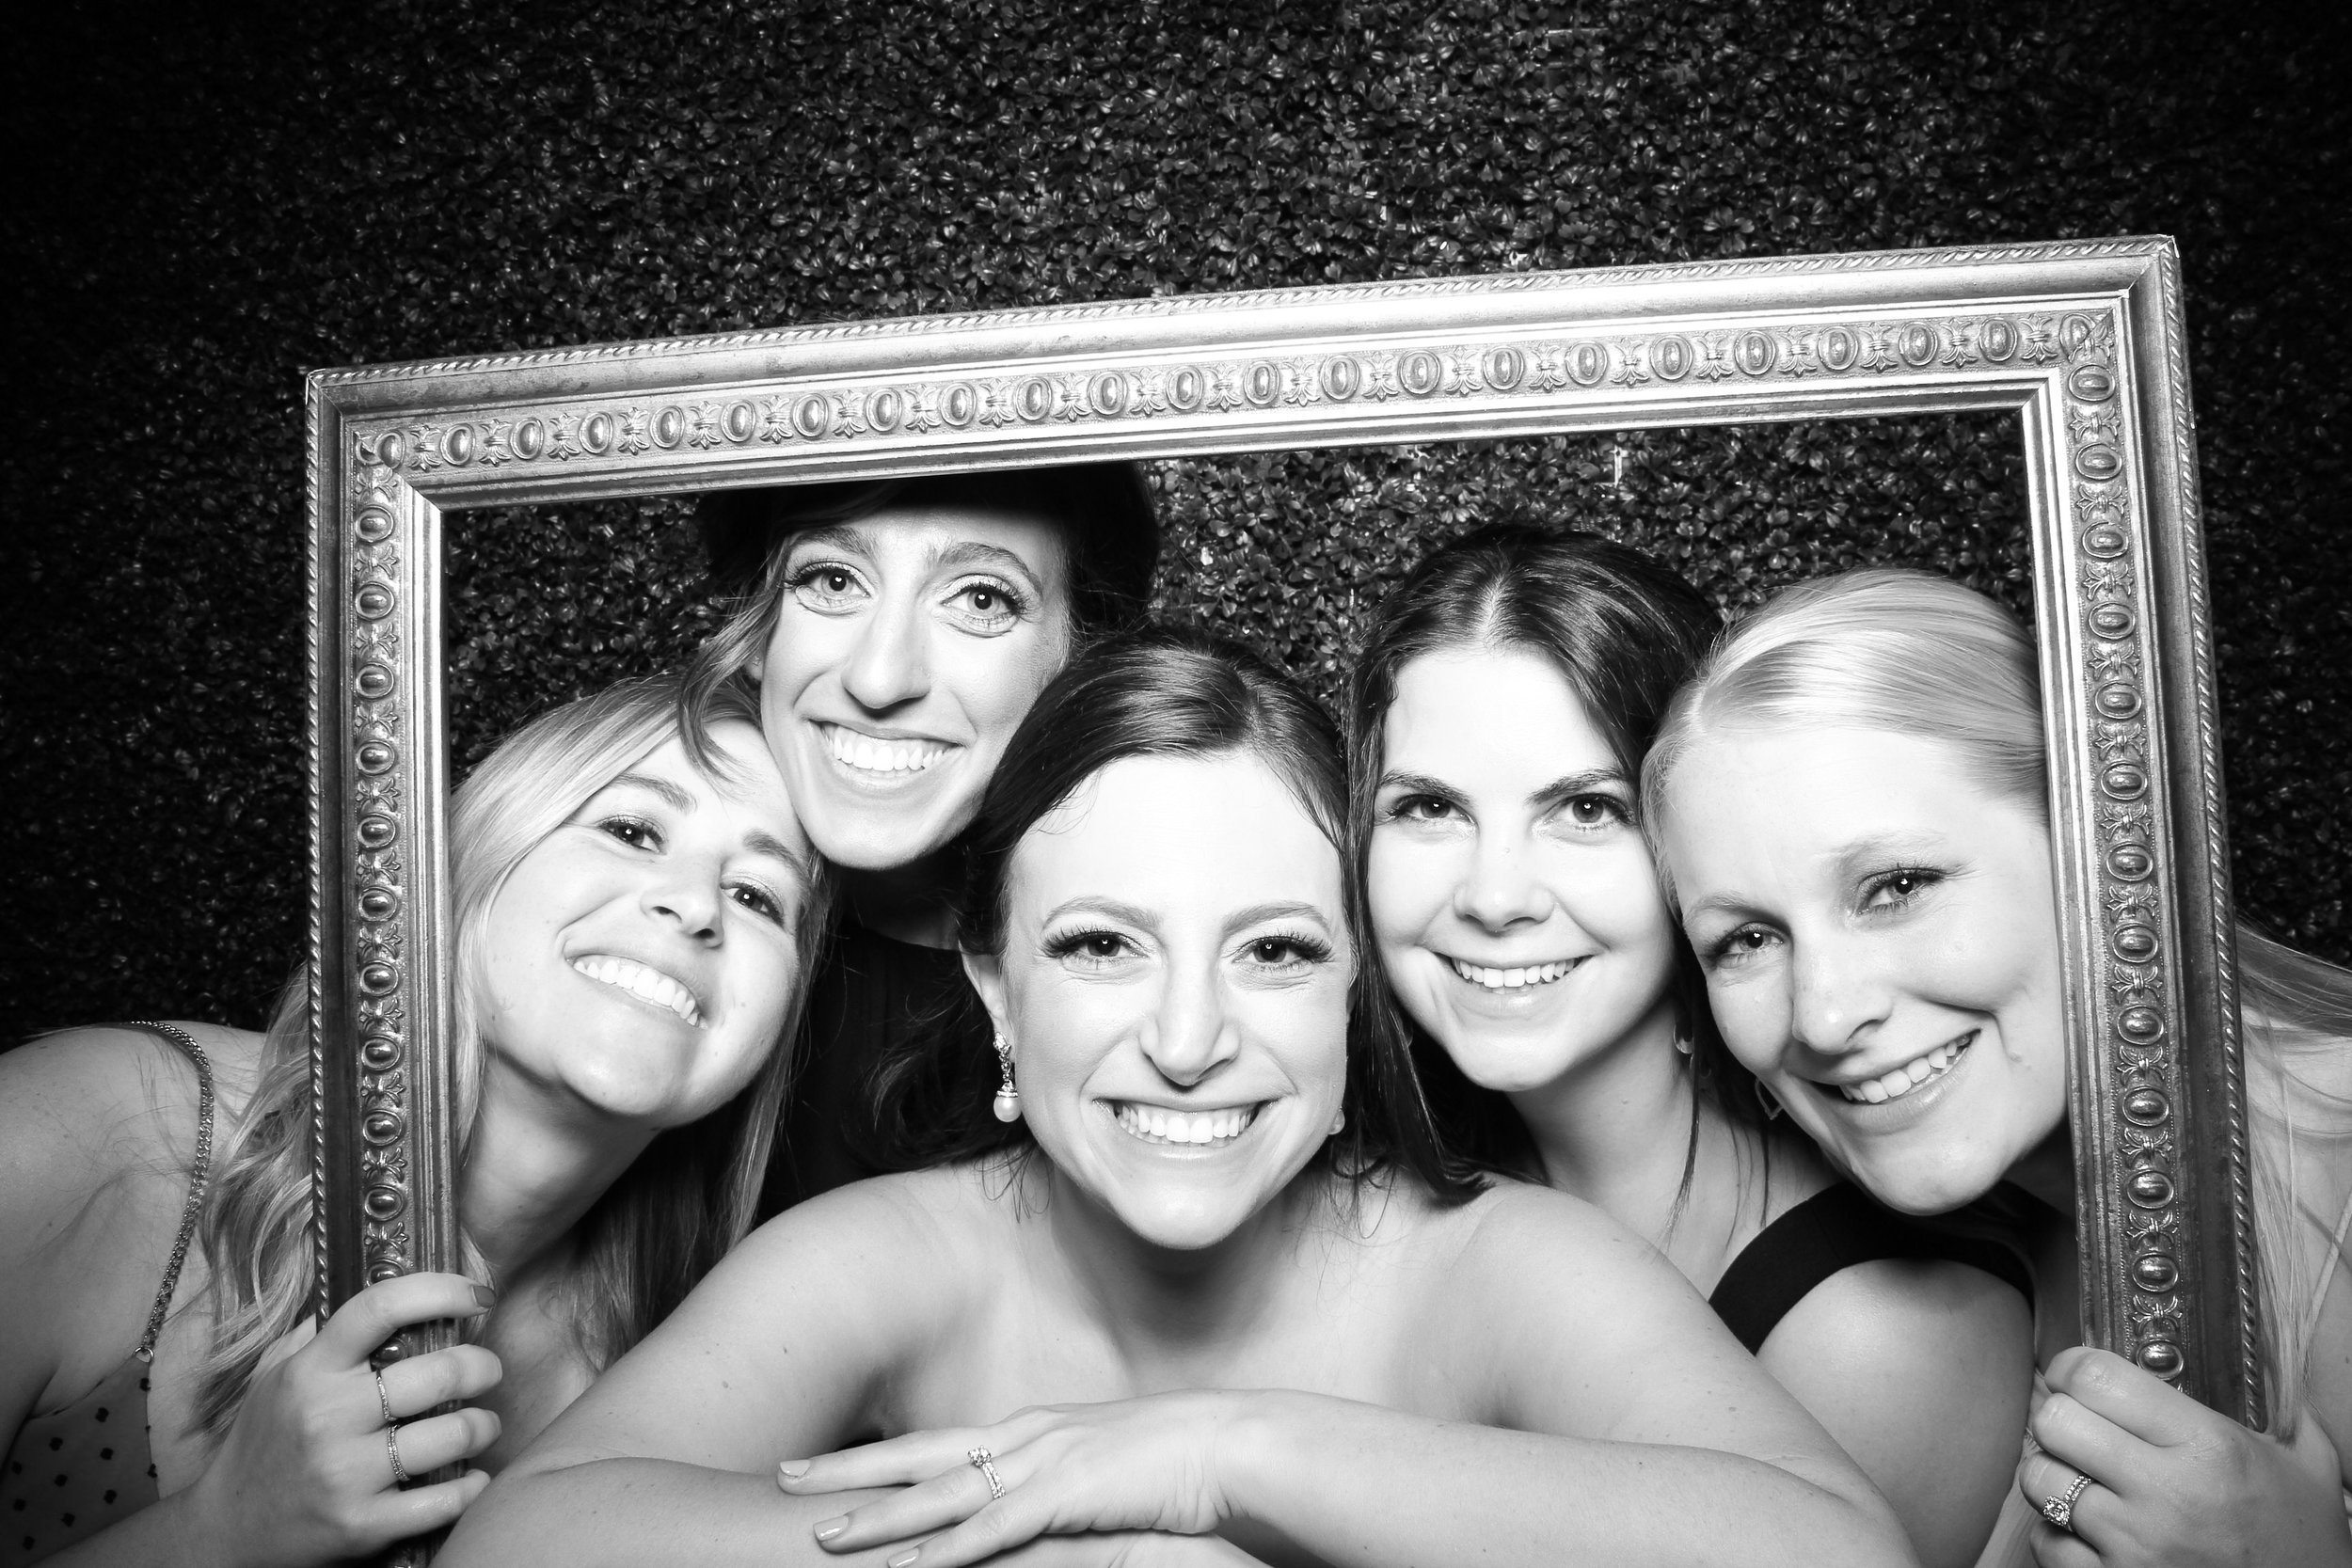 Ivy_Room_Chicago_Wedding_Reception_Photo_Booth_Rental__15.jpg